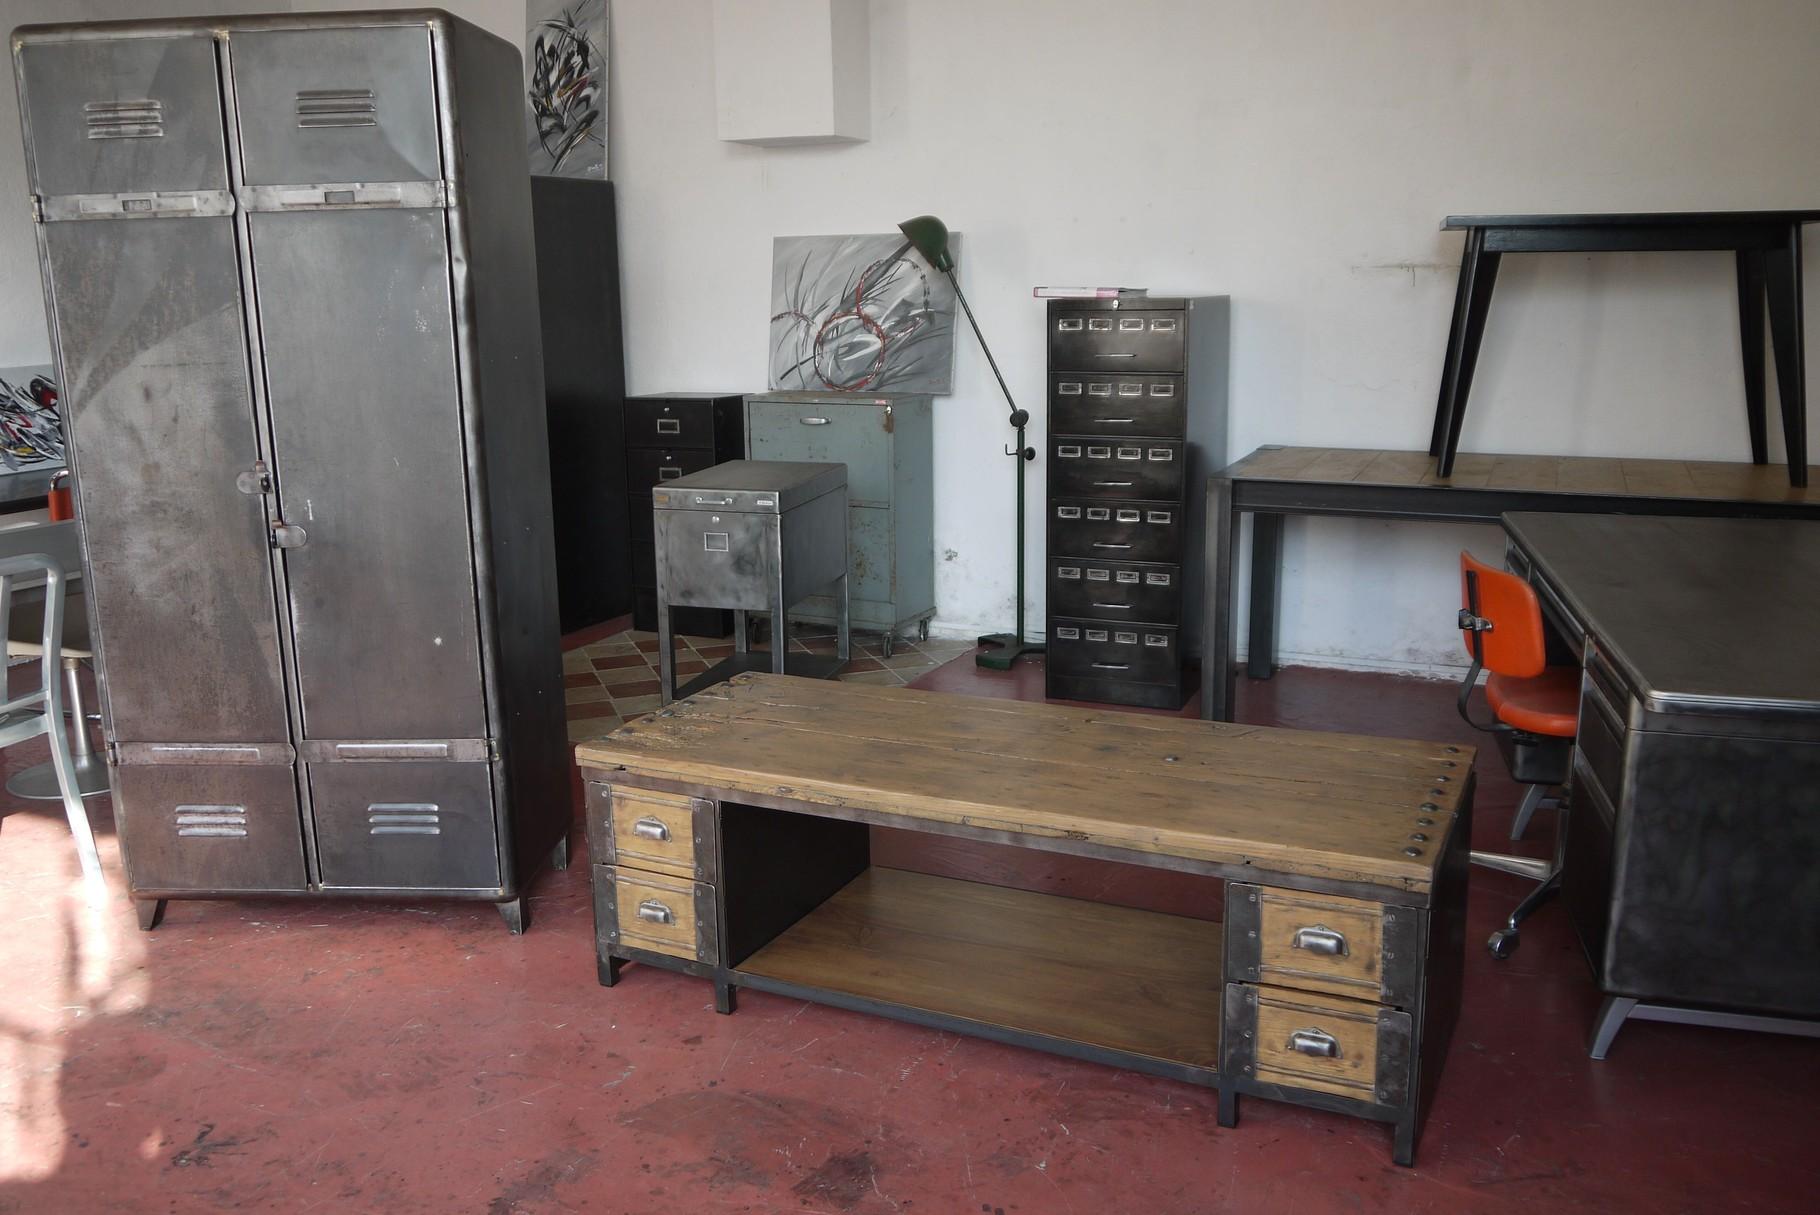 table basse meuble tv industriel atelier vintage mobilier industriel lyon. Black Bedroom Furniture Sets. Home Design Ideas